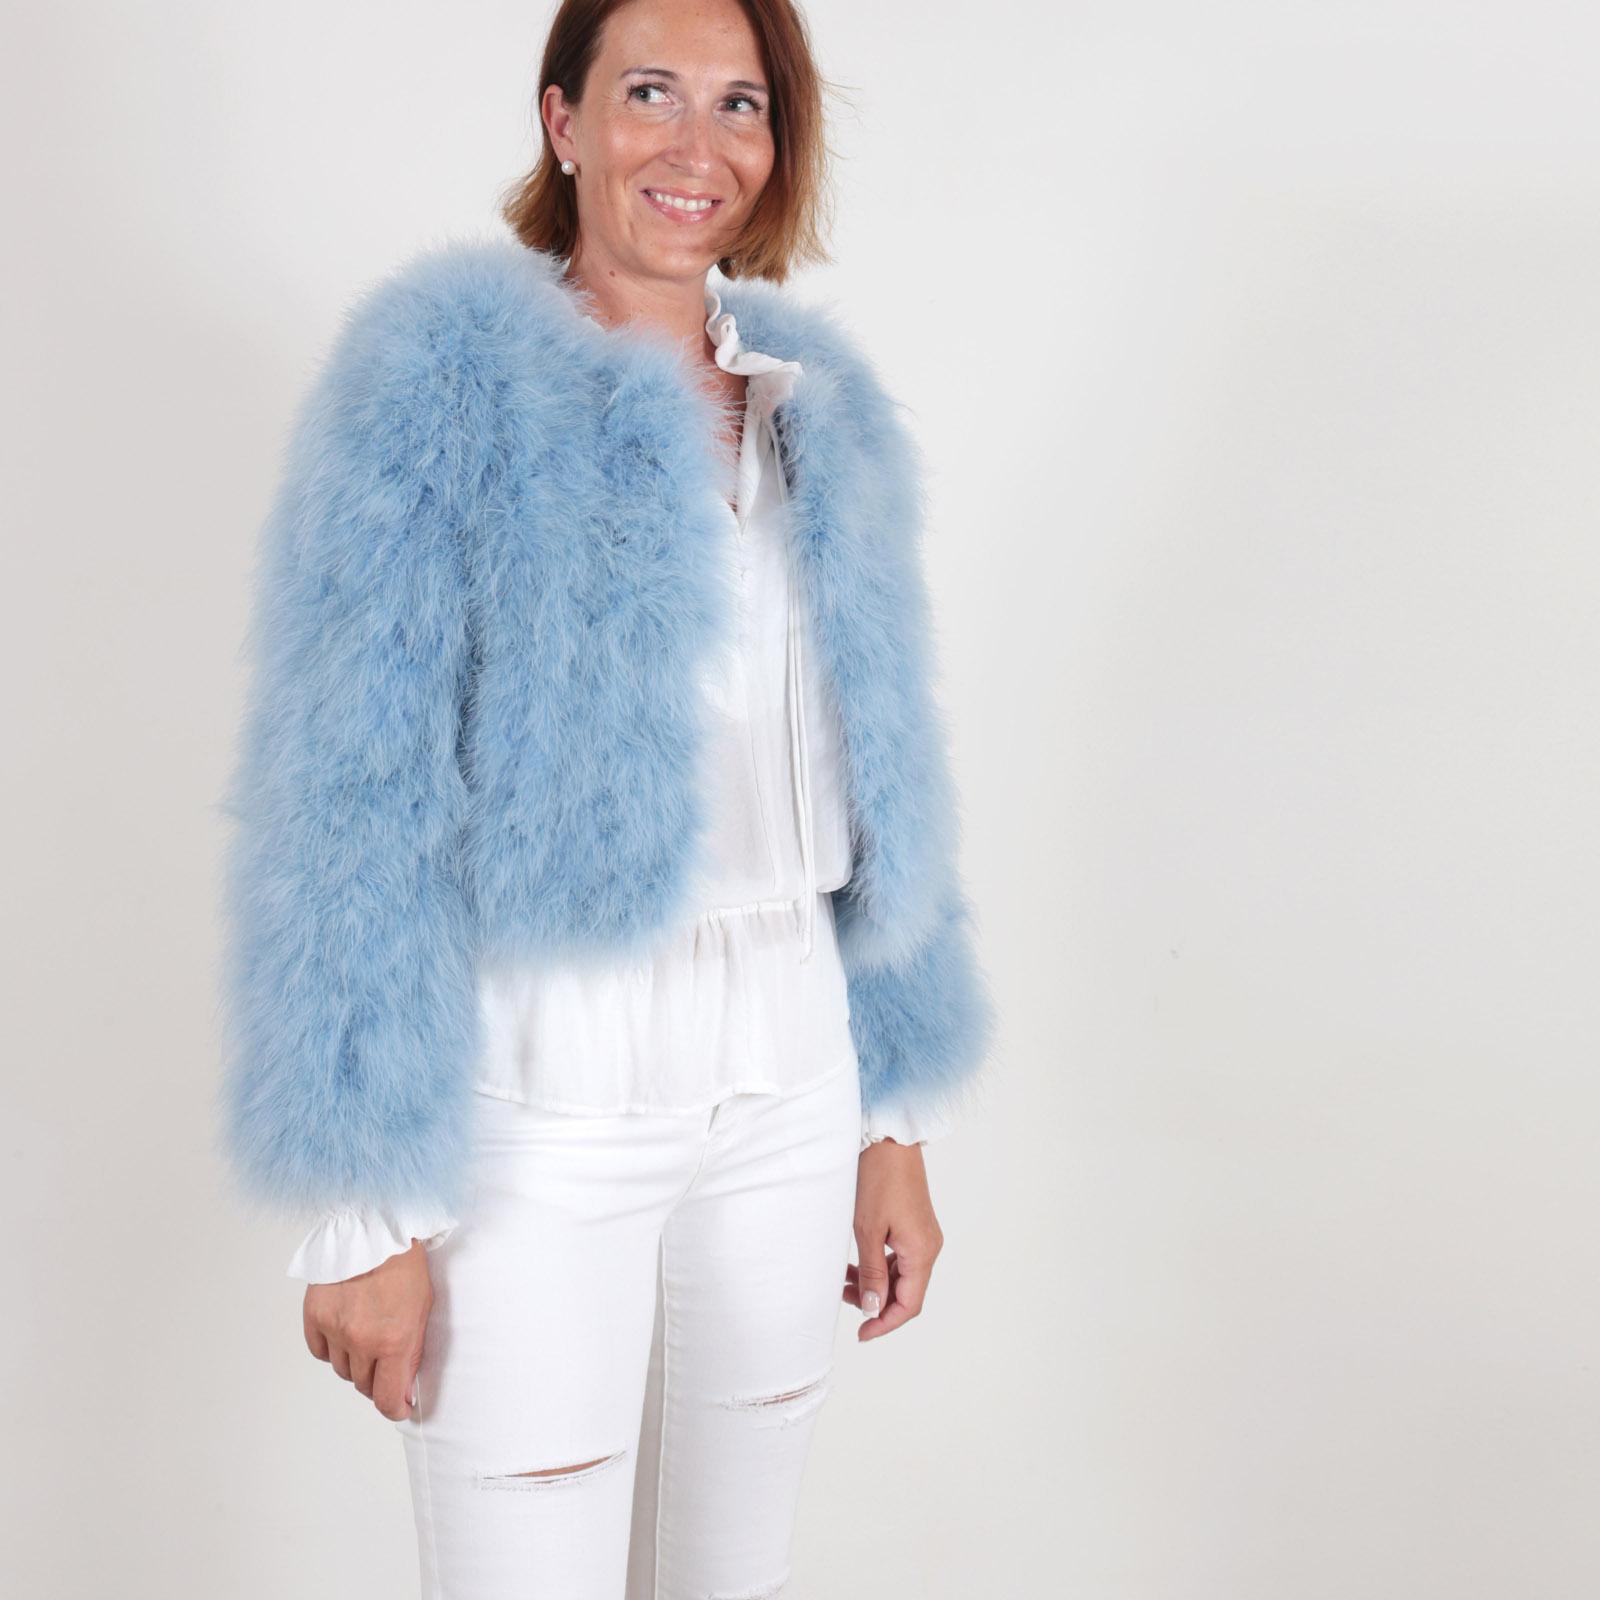 EYES ON MISHA Feather Bolero Jacket La Fiffi Dust Blue